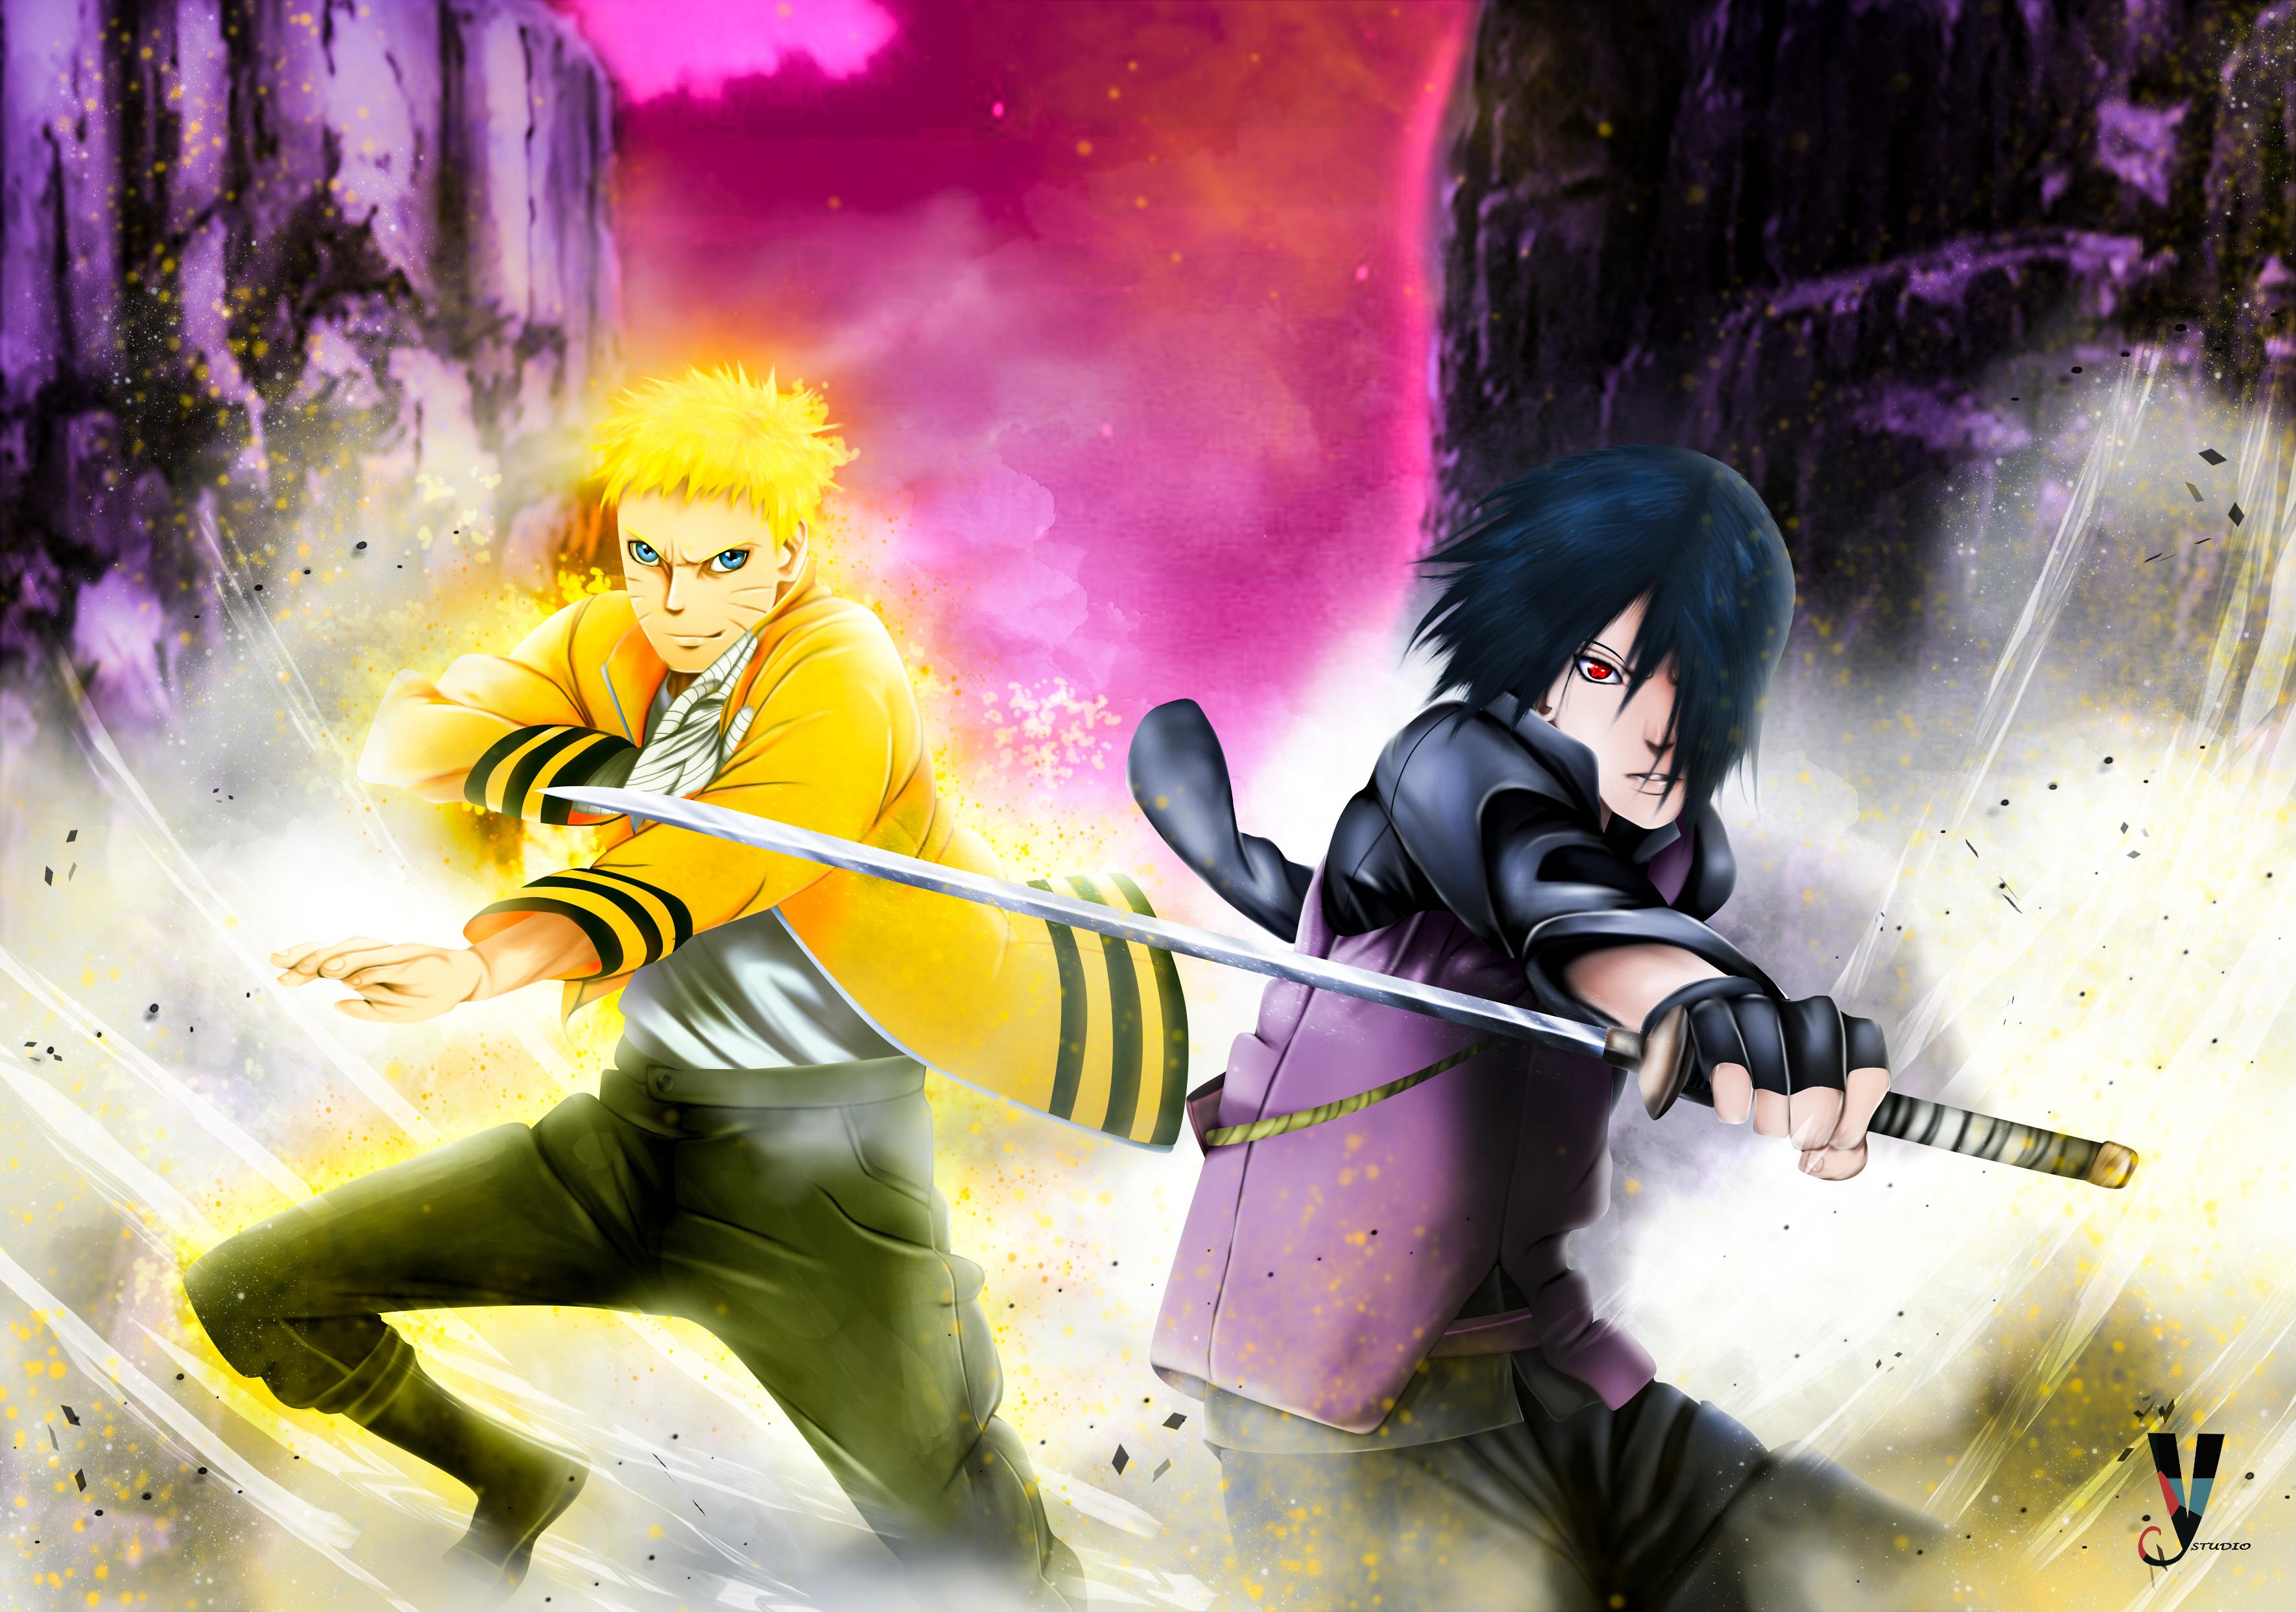 4k Naruto E Sasuke 21059 Hd Wallpaper Backgrounds Download